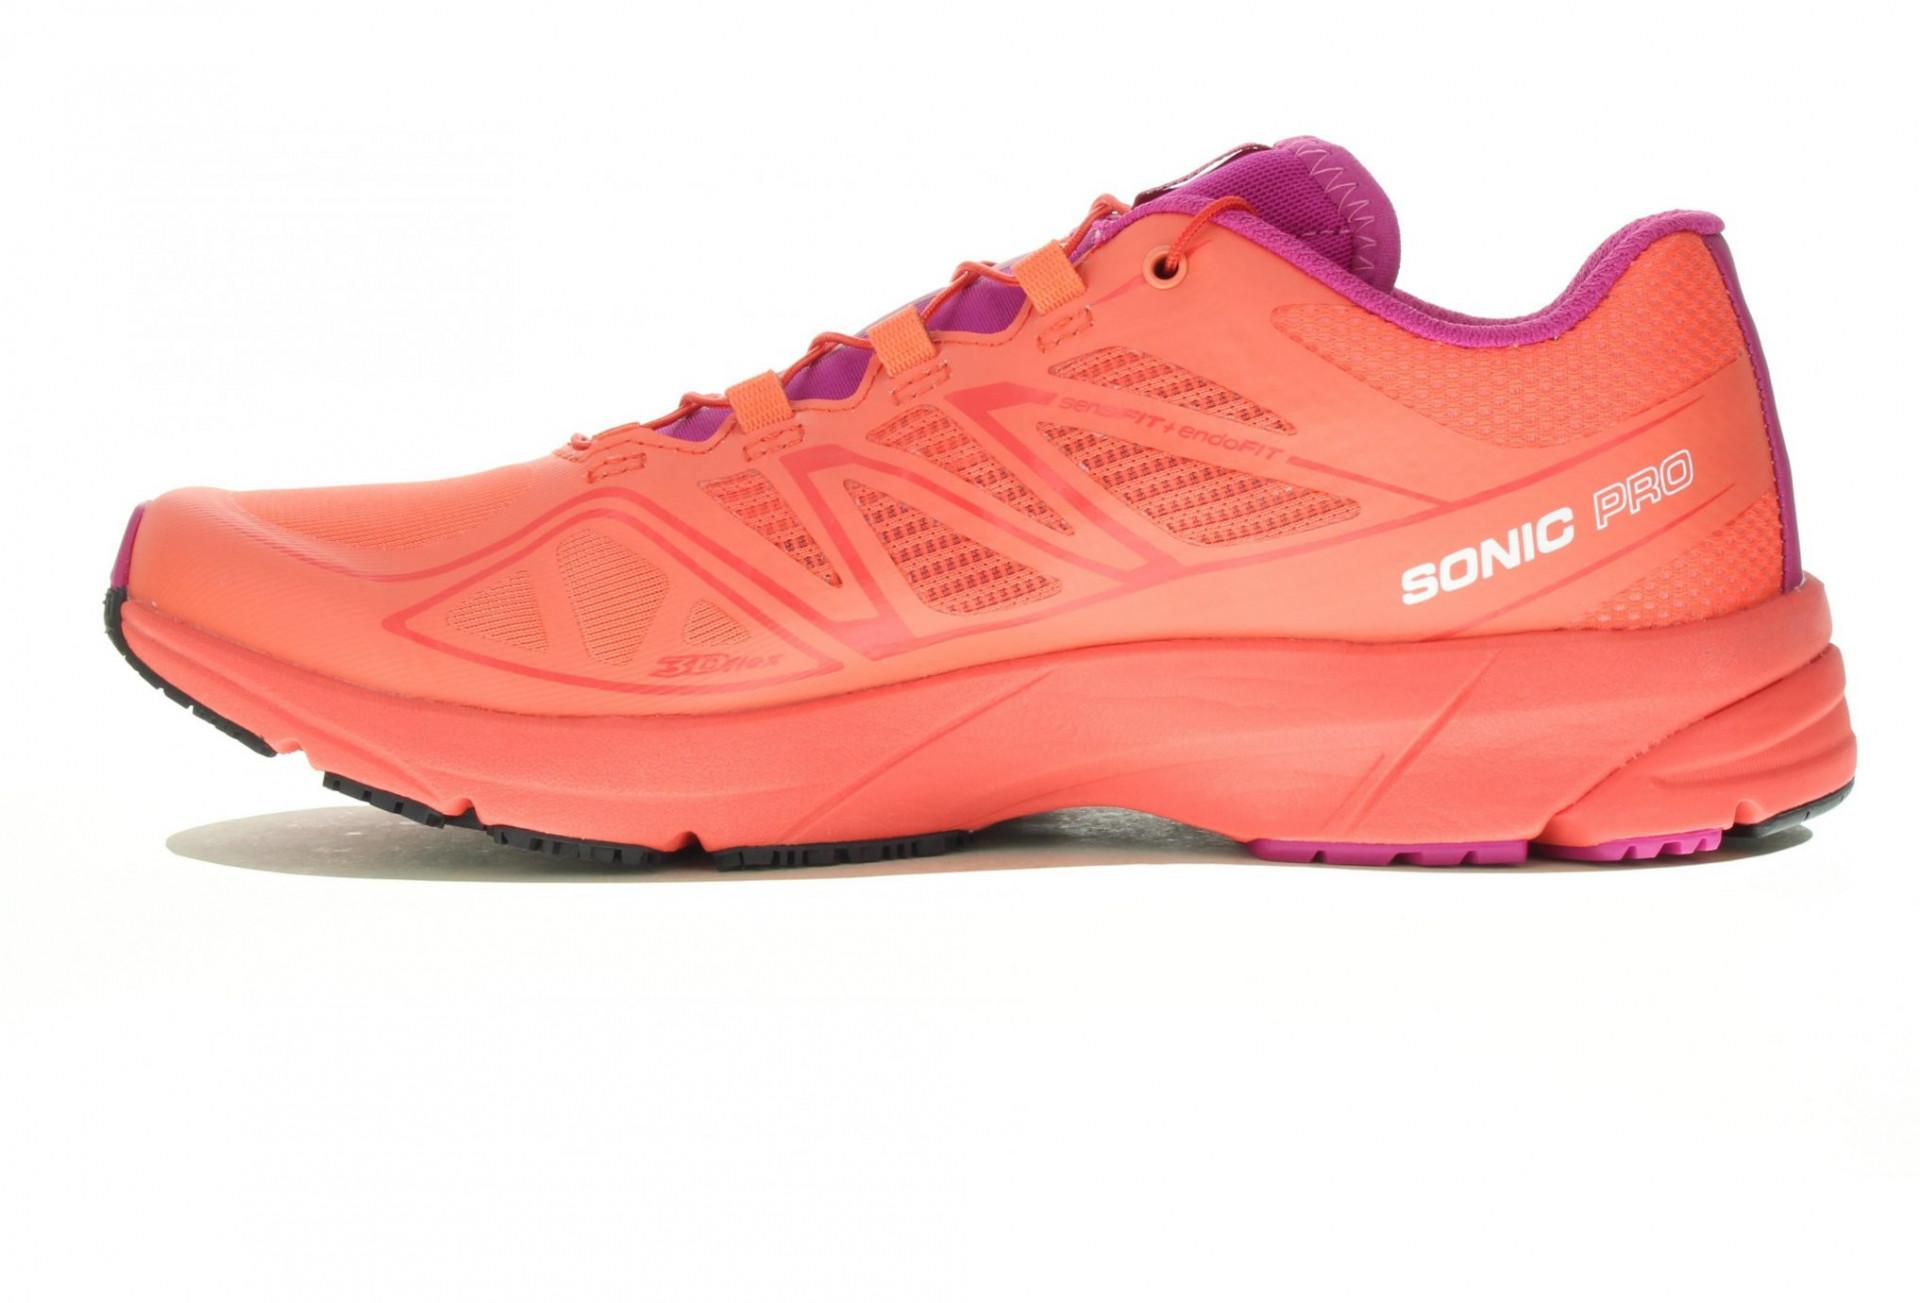 Chaussure de running Salomon Sonic pro femme